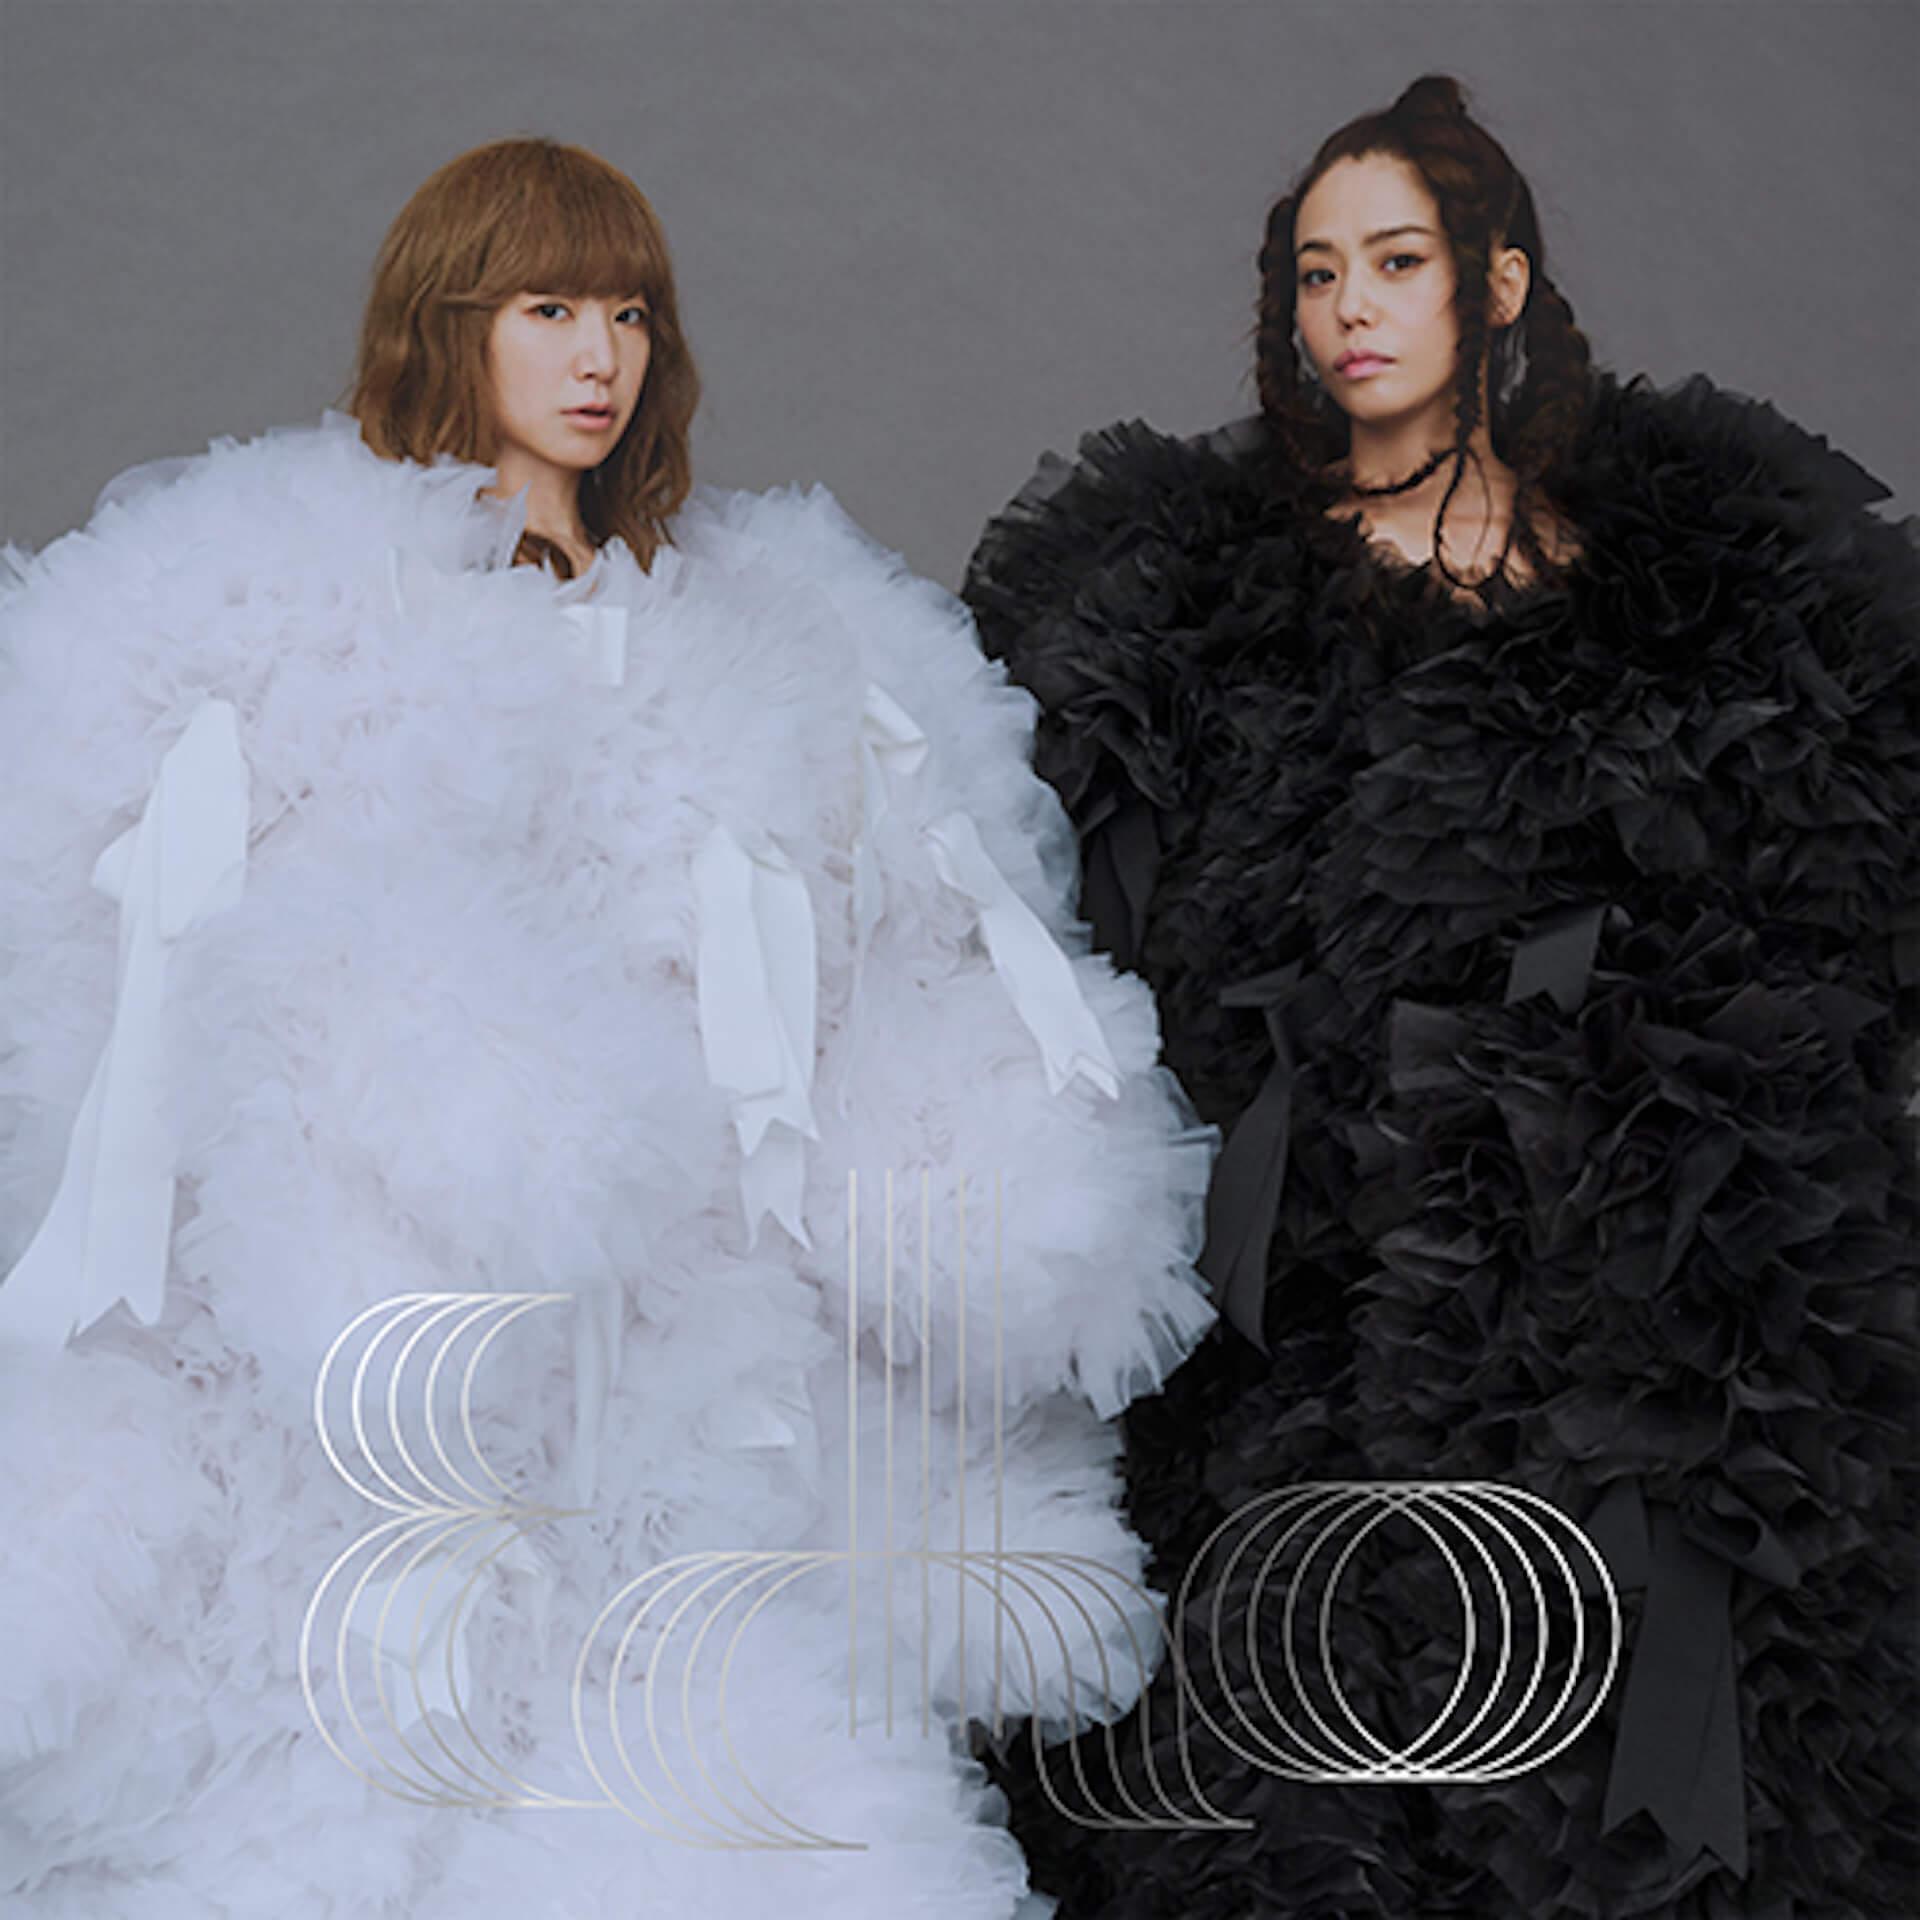 YUKI、東京国際フォーラムでの最新ライブ映像とミュージックビデオ集『ユキビデオ4』の同時リリースを発表! music200115_yuki_1